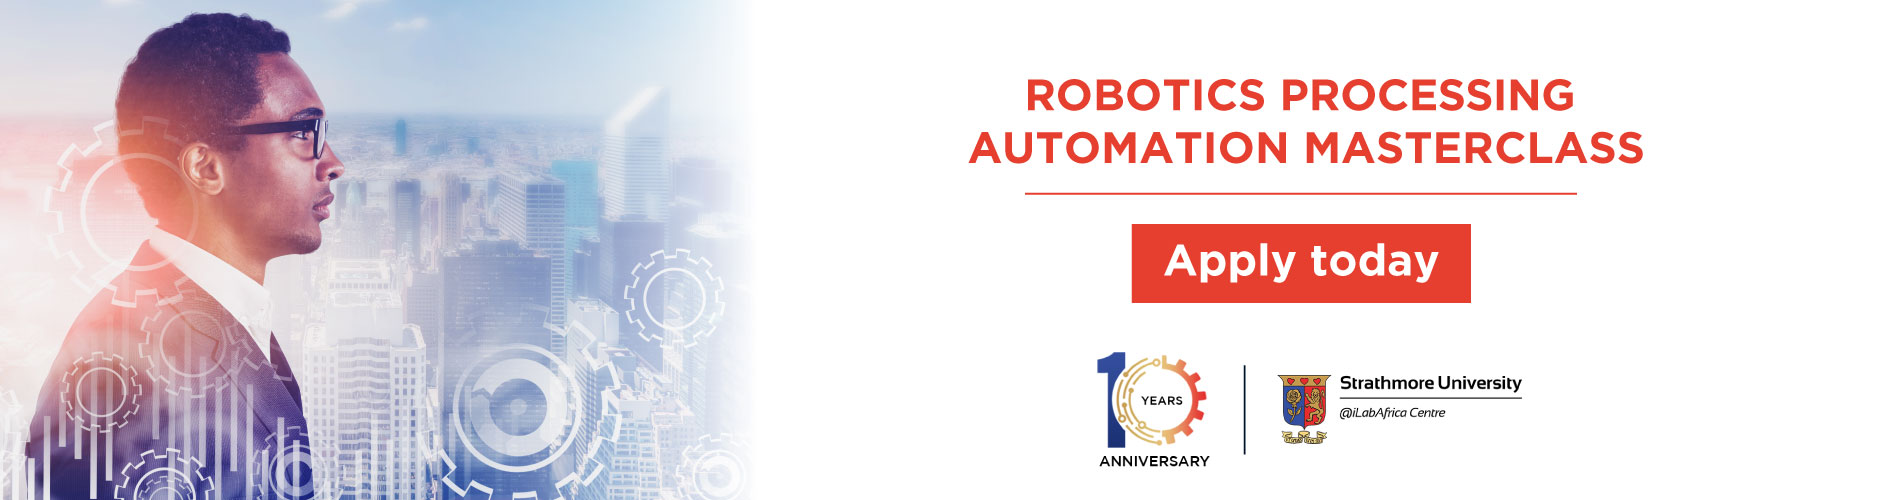 ROBOTICS-BANNER